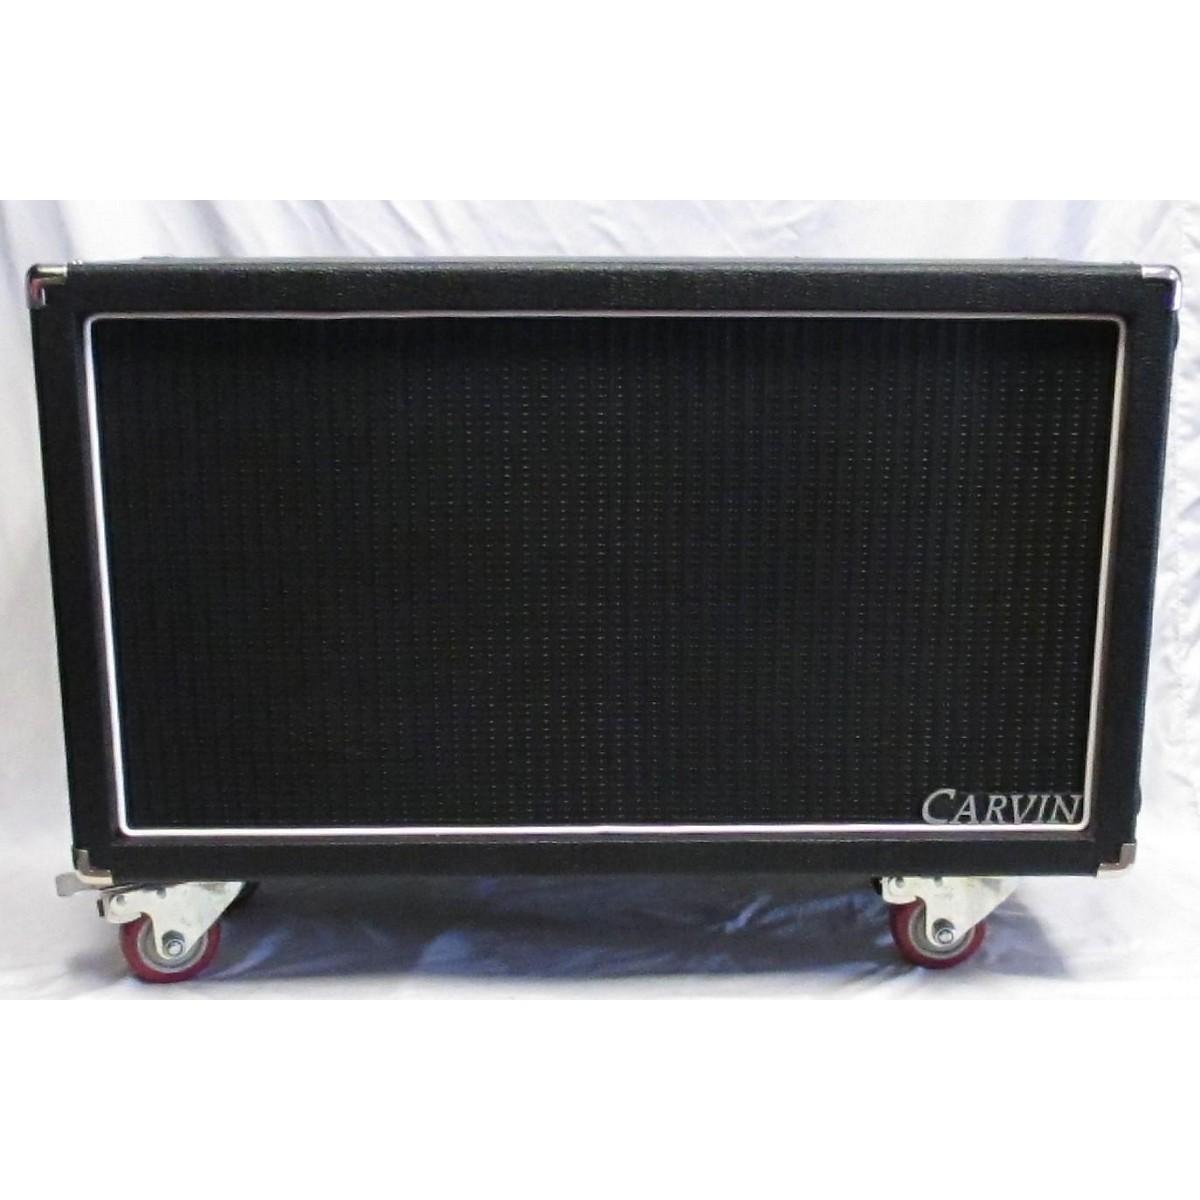 Carvin VX212 Tube Guitar Amp Head